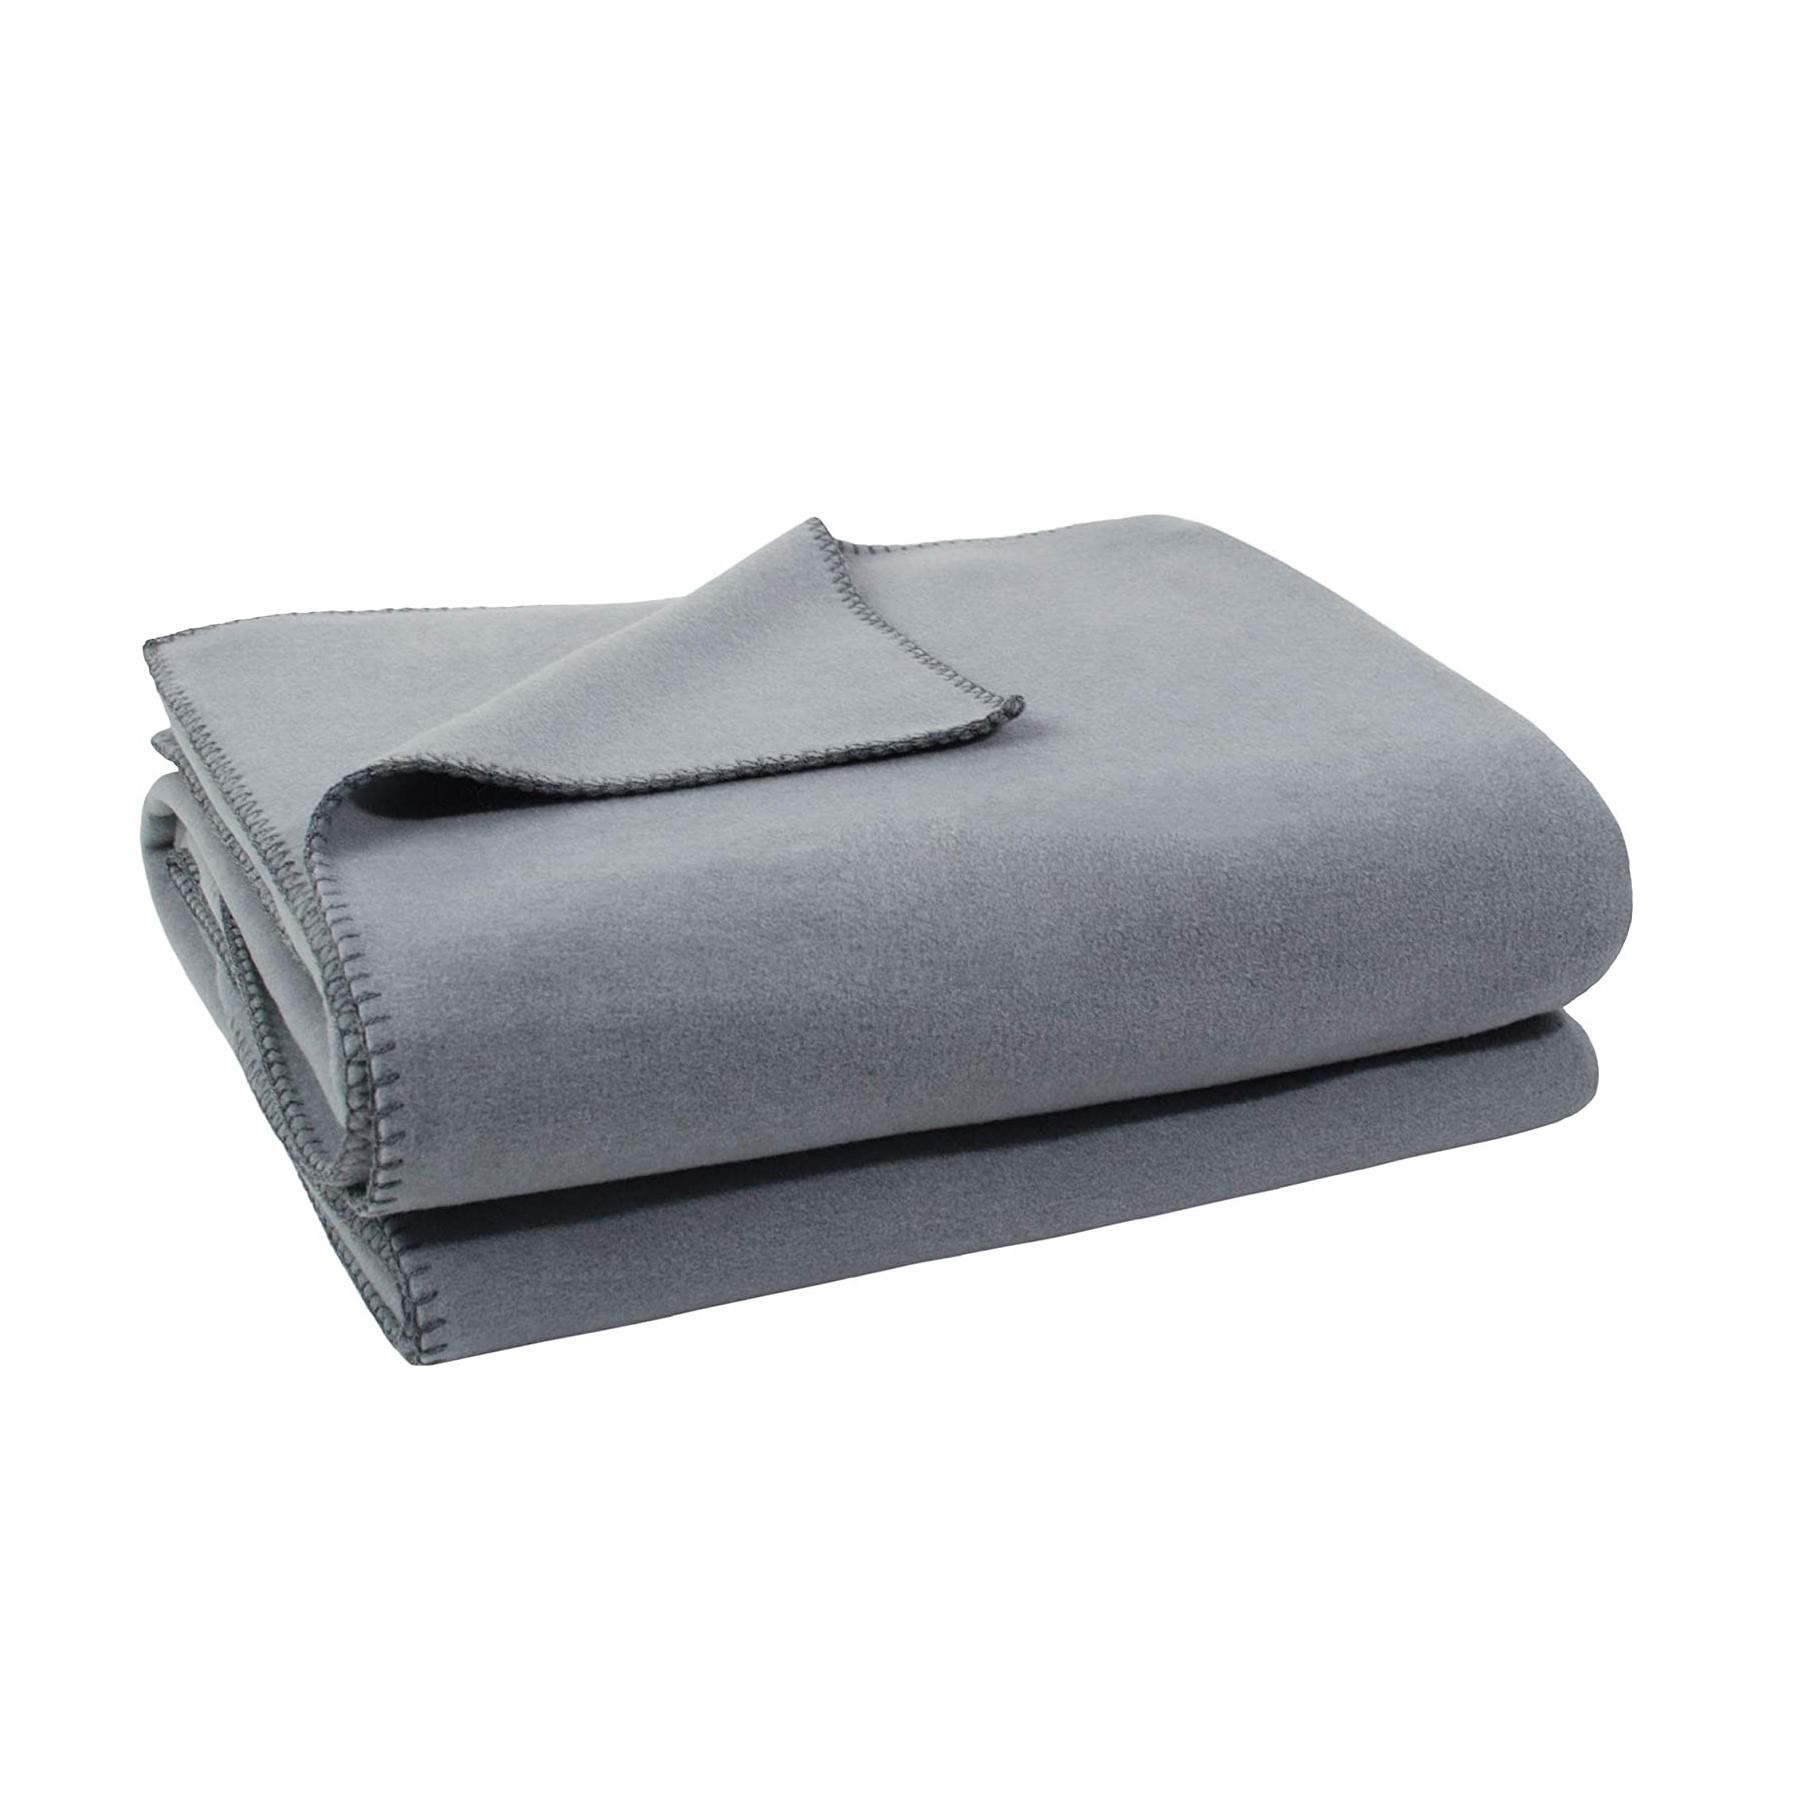 Zoeppritz Soft-Fleece Decke 160x200cm